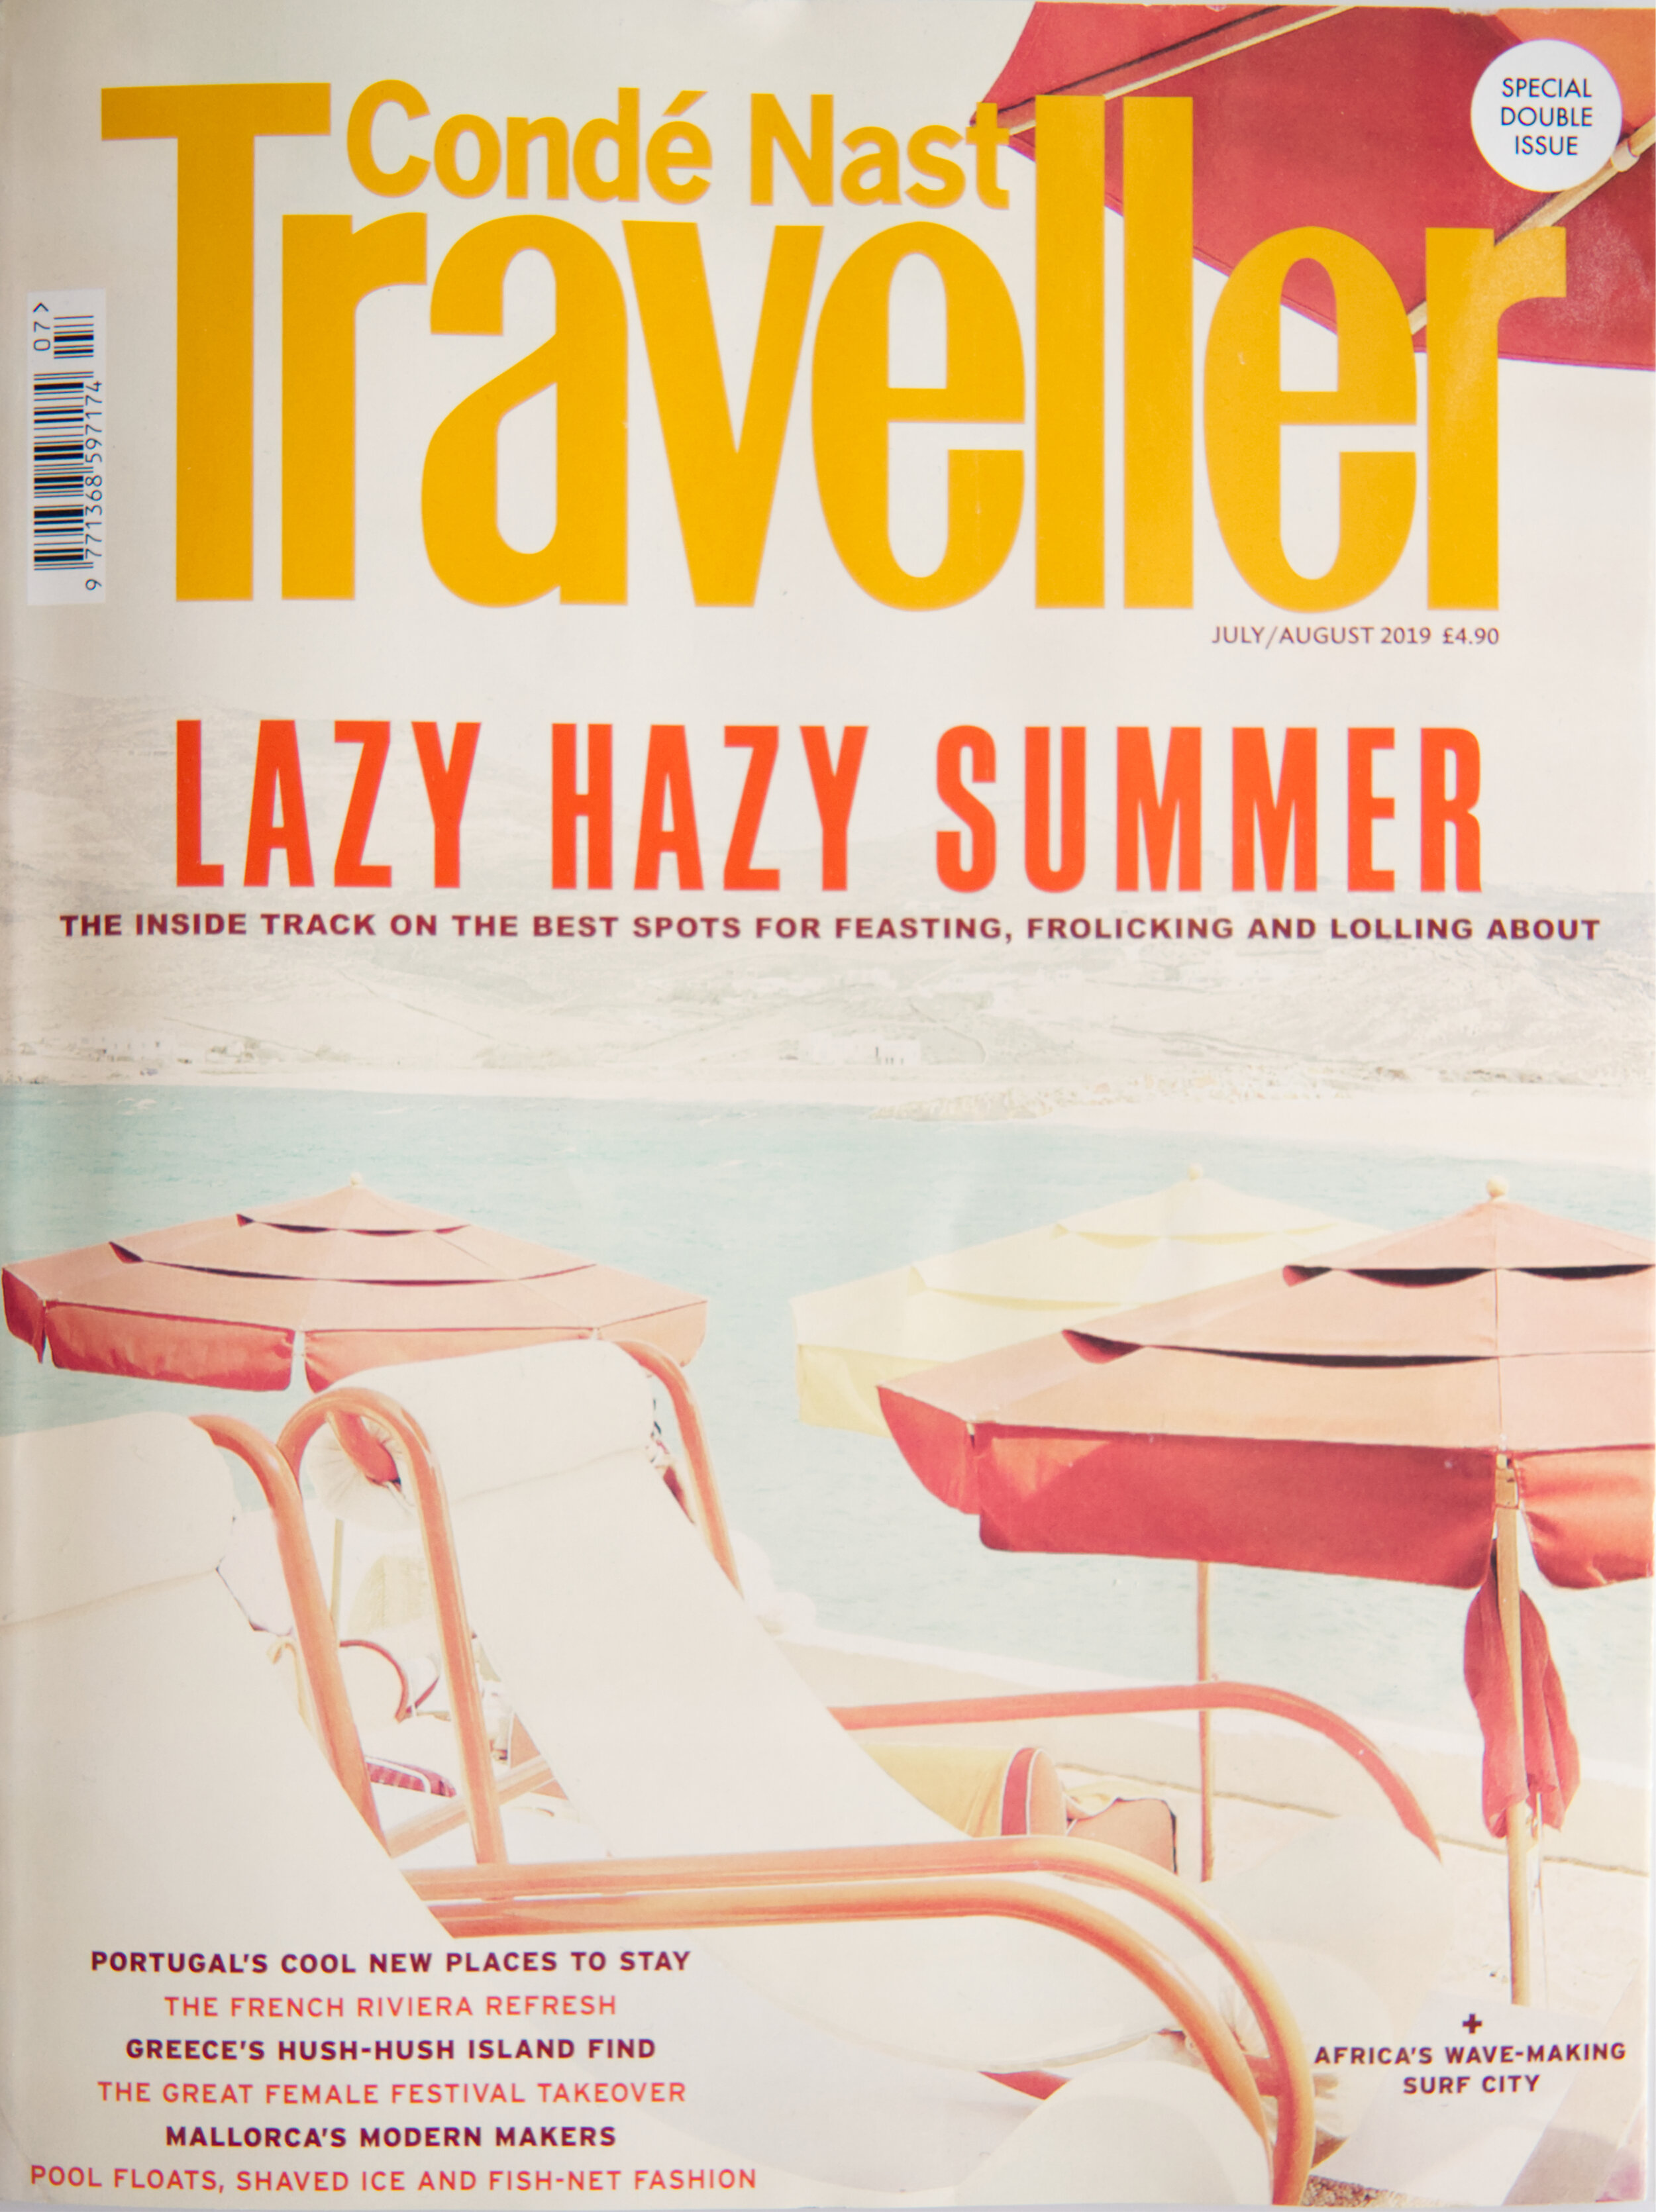 conde-nast-traveller-juli-august-2019-cover.jpg